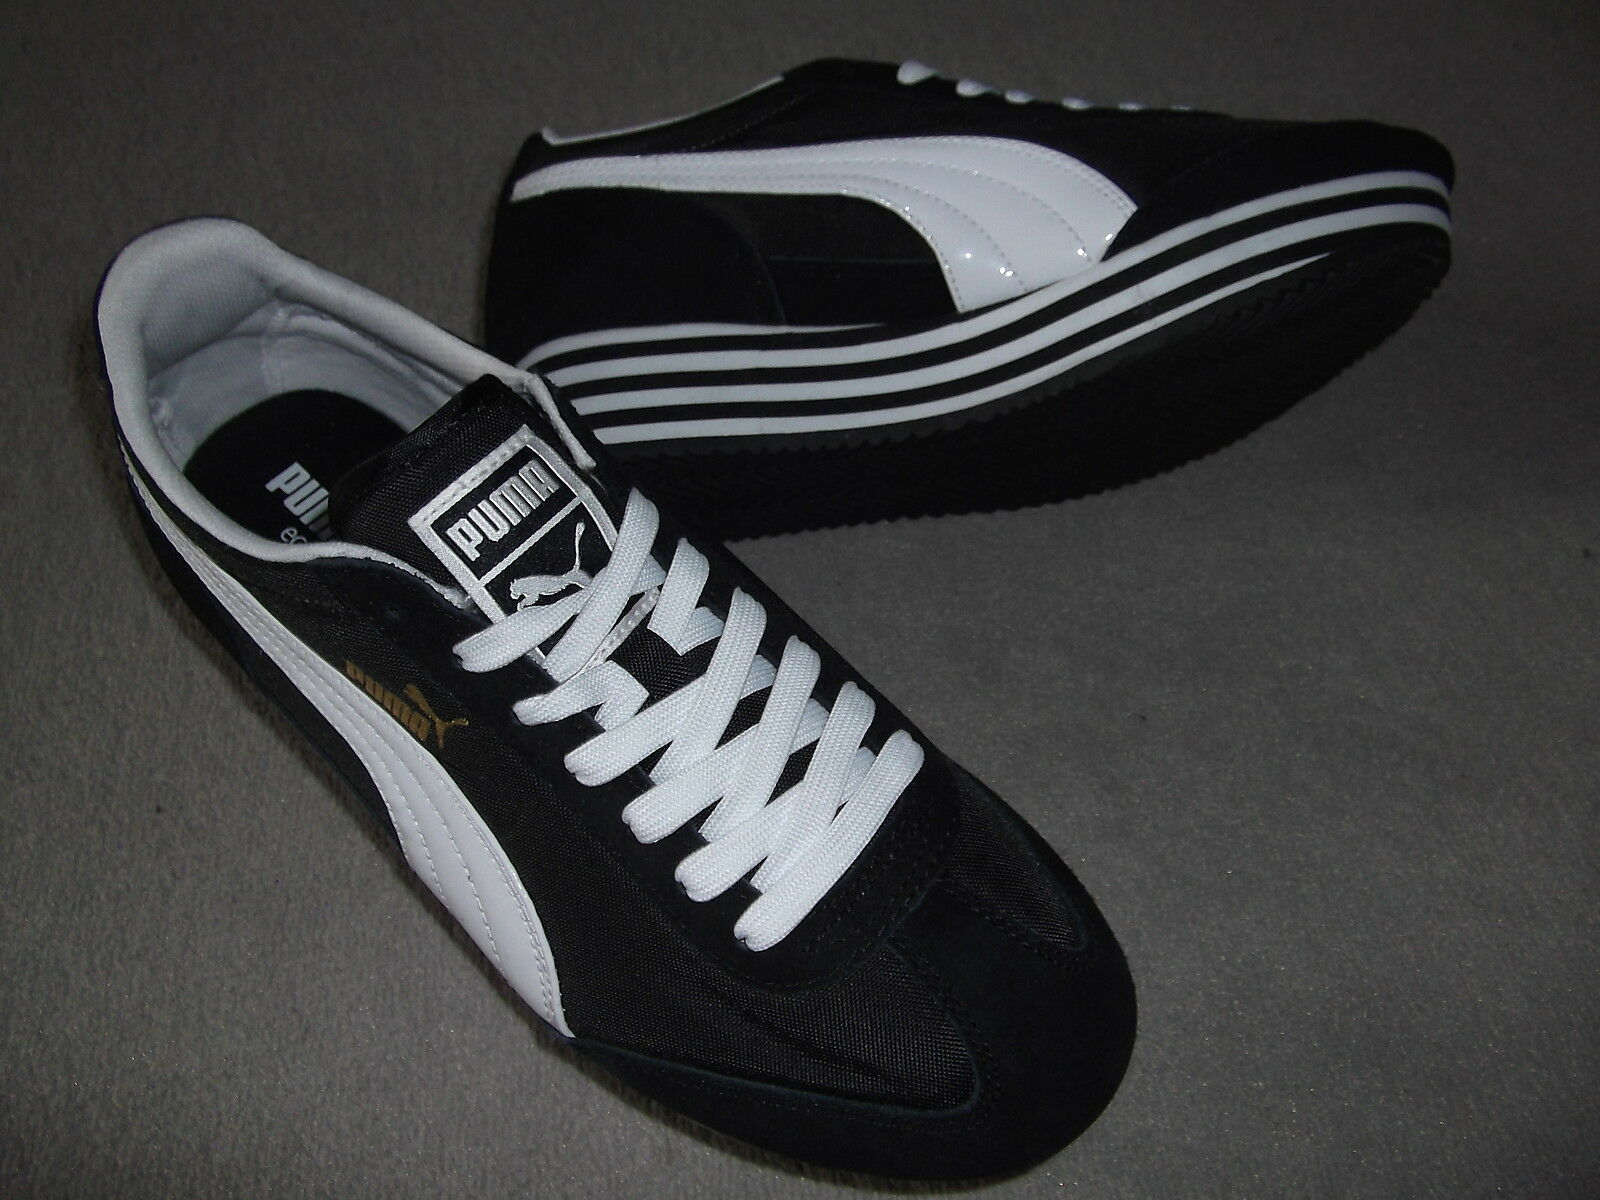 NEU MARKEN Schuhe Sportschuhe Sneaker PUMA ECO ORTHLITE 40 6,5 Damen